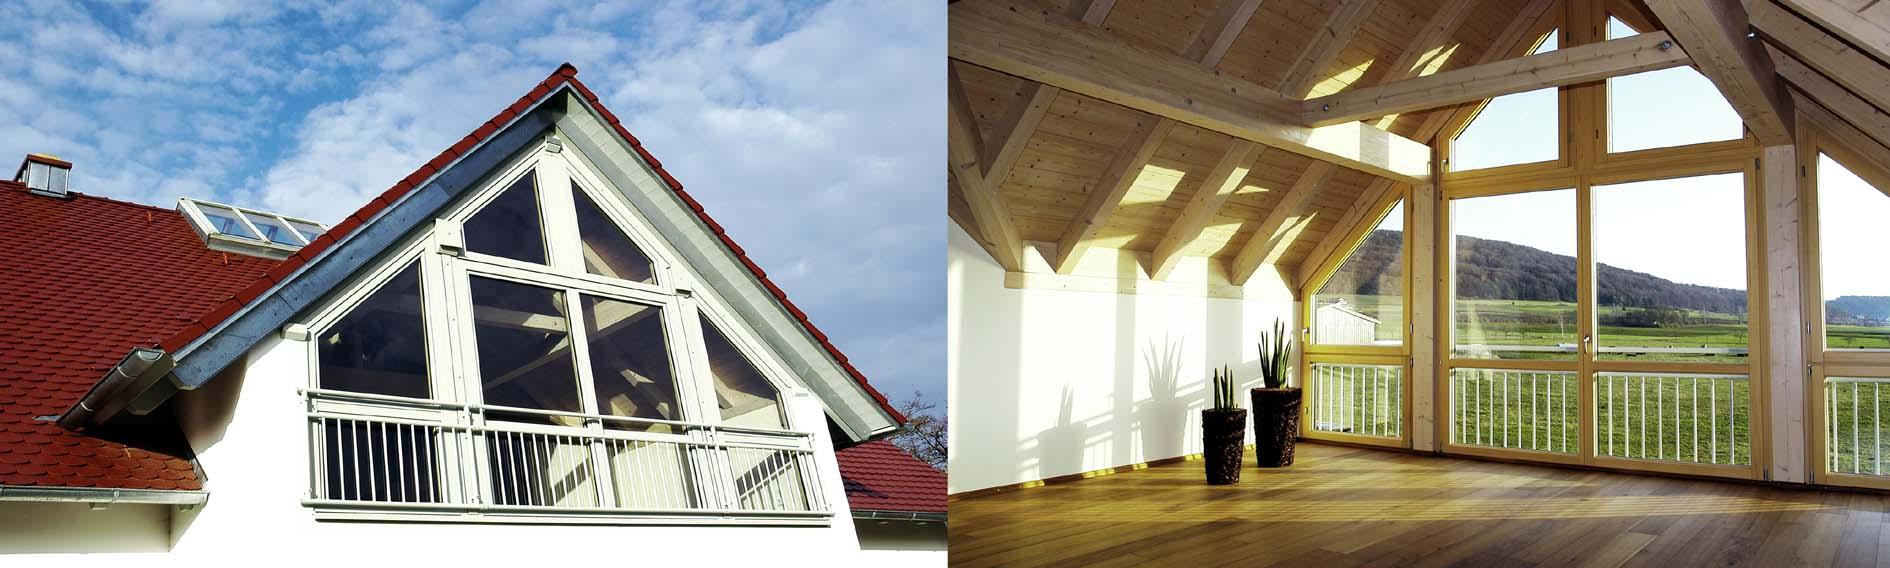 Loft conservatory ThermaDura